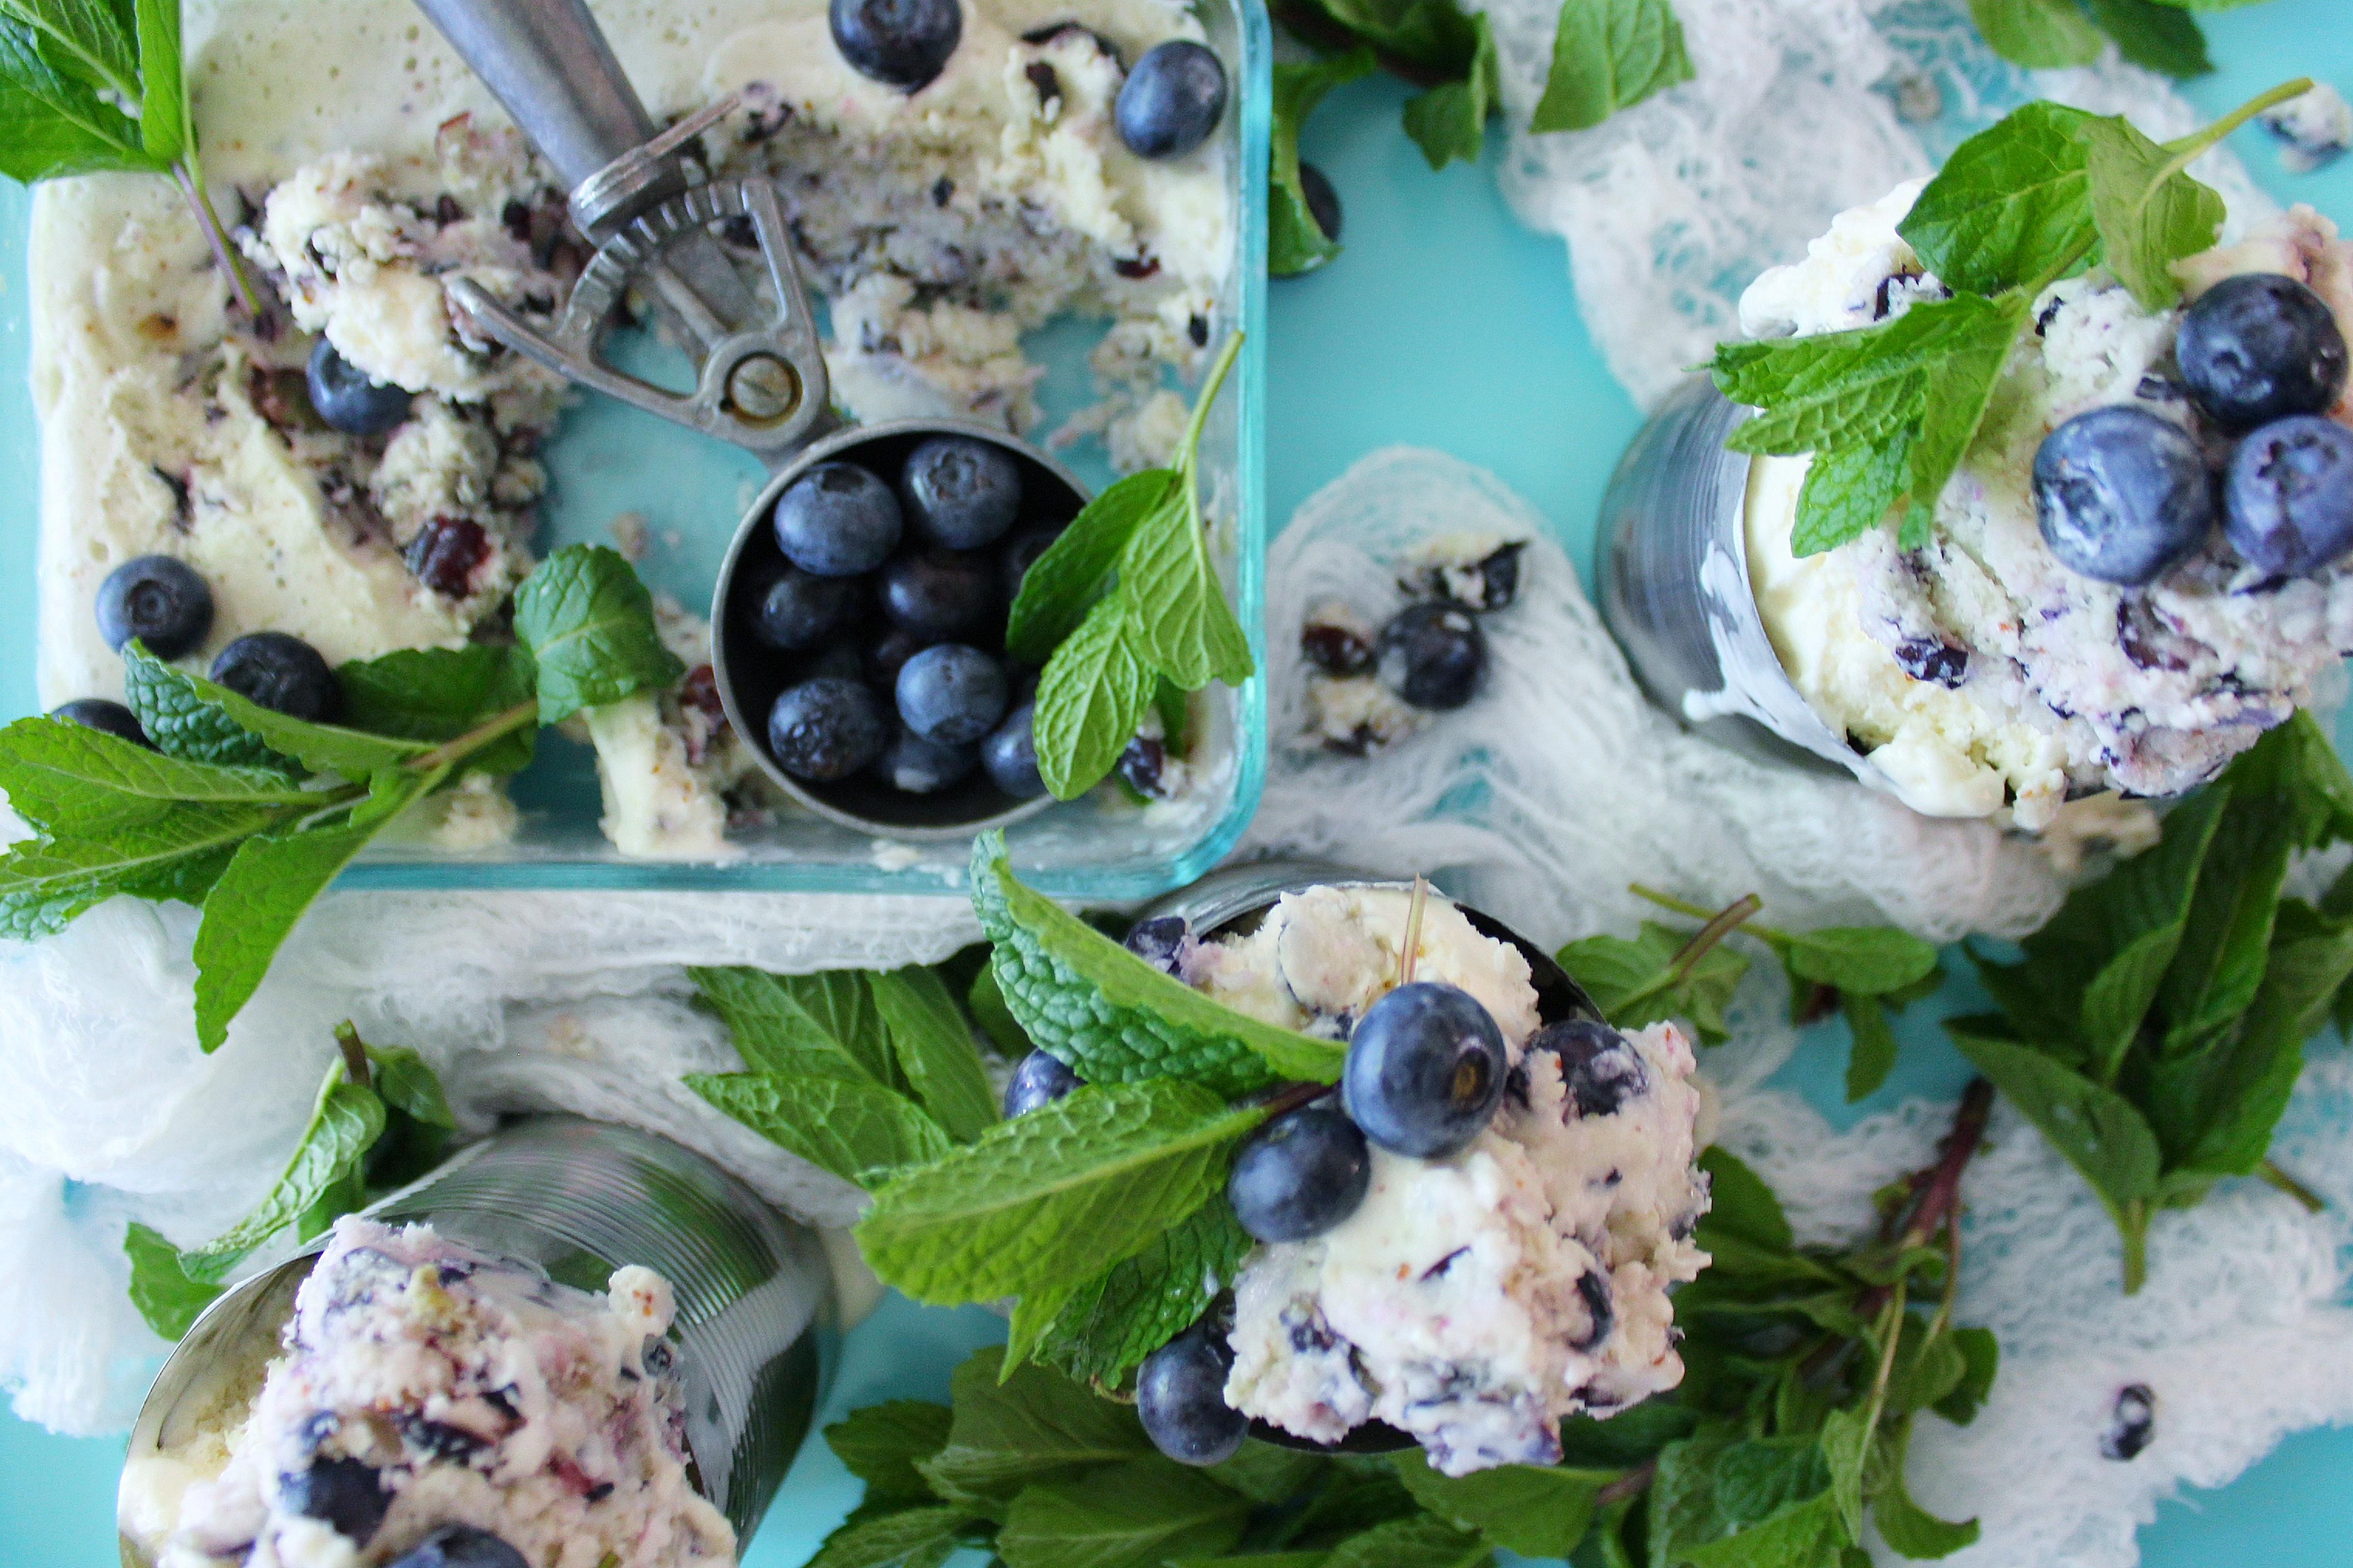 No churn banana/blue ice cream